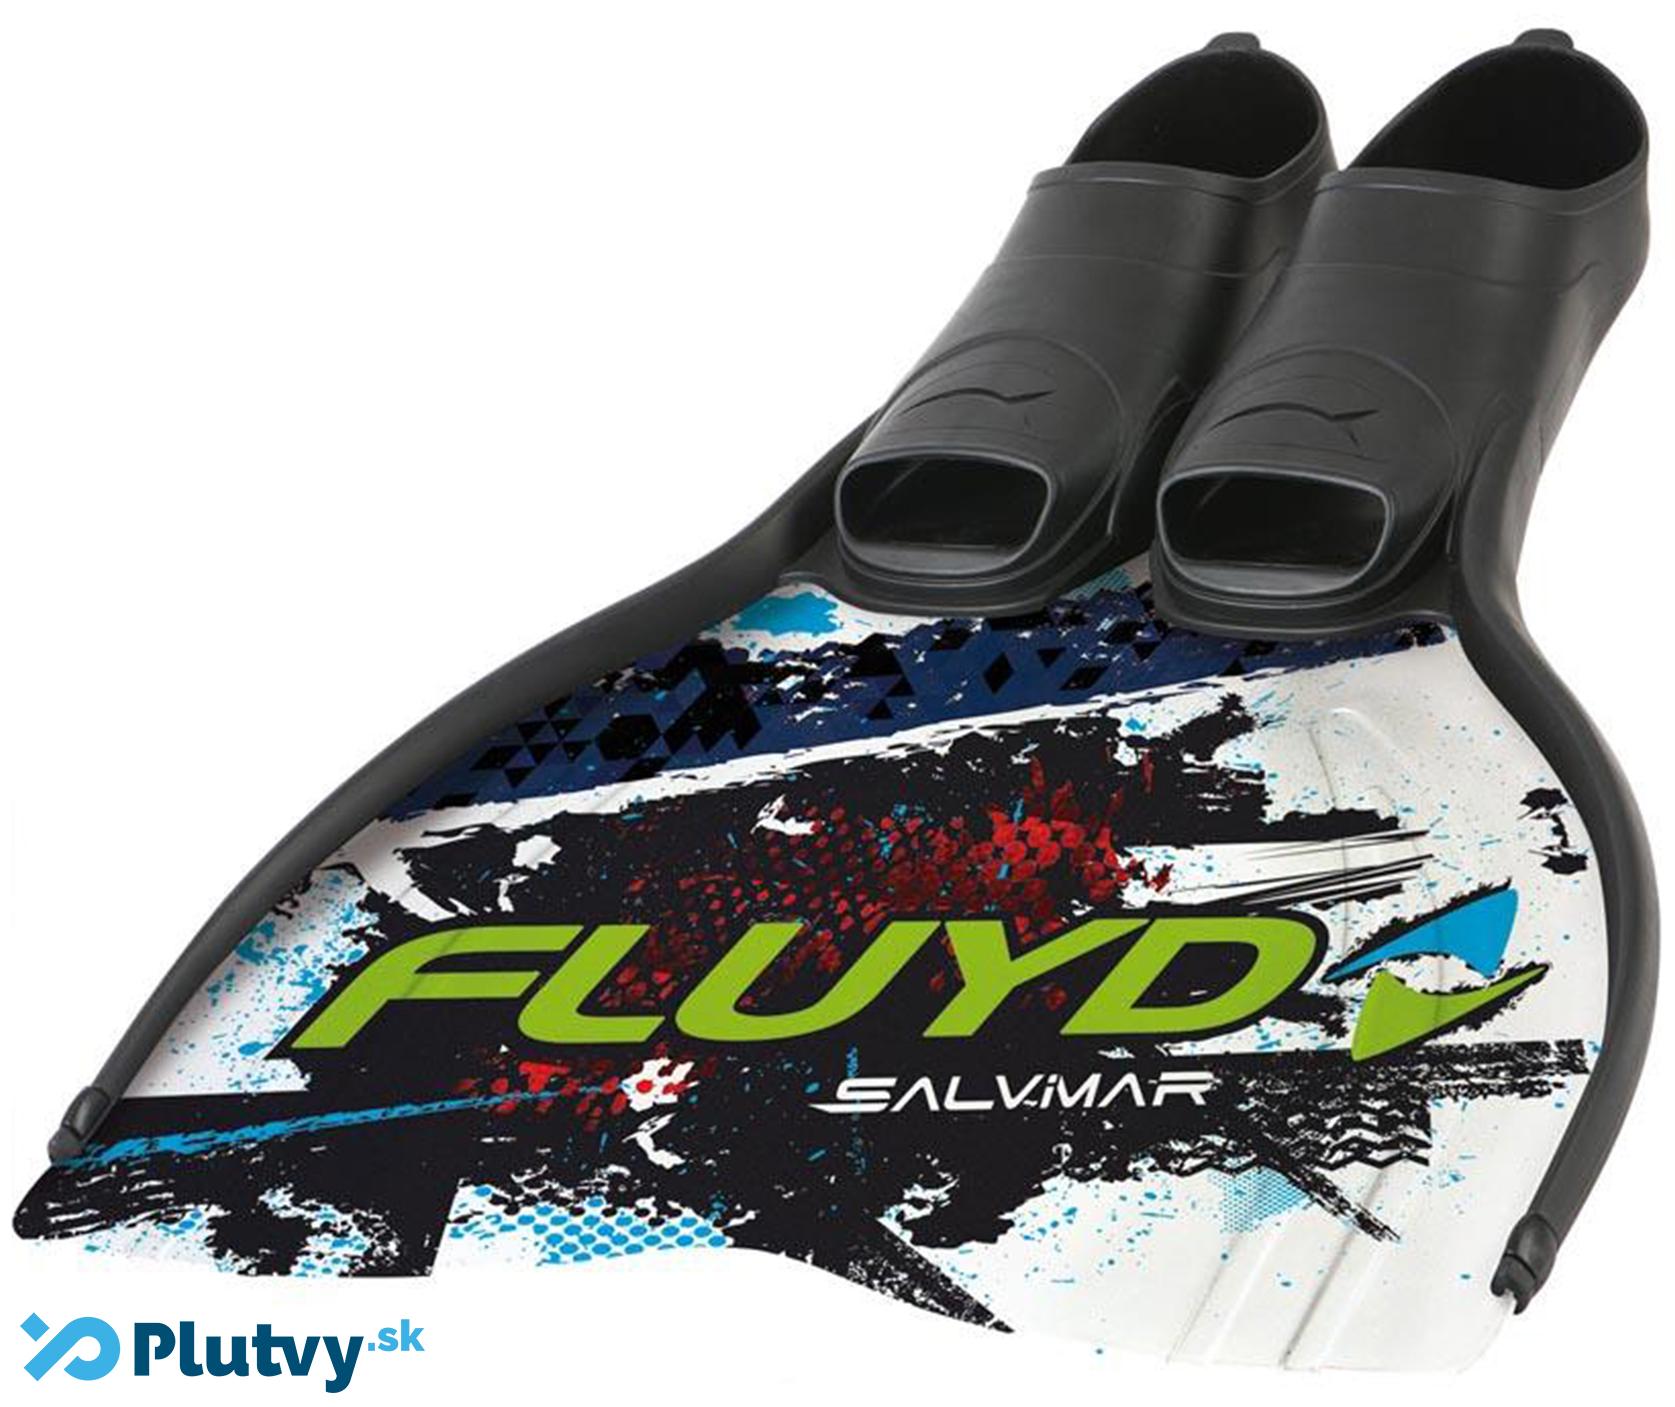 plavecka-monoplutva-na-freediving-salvimar-fluyd-plutvy_sk